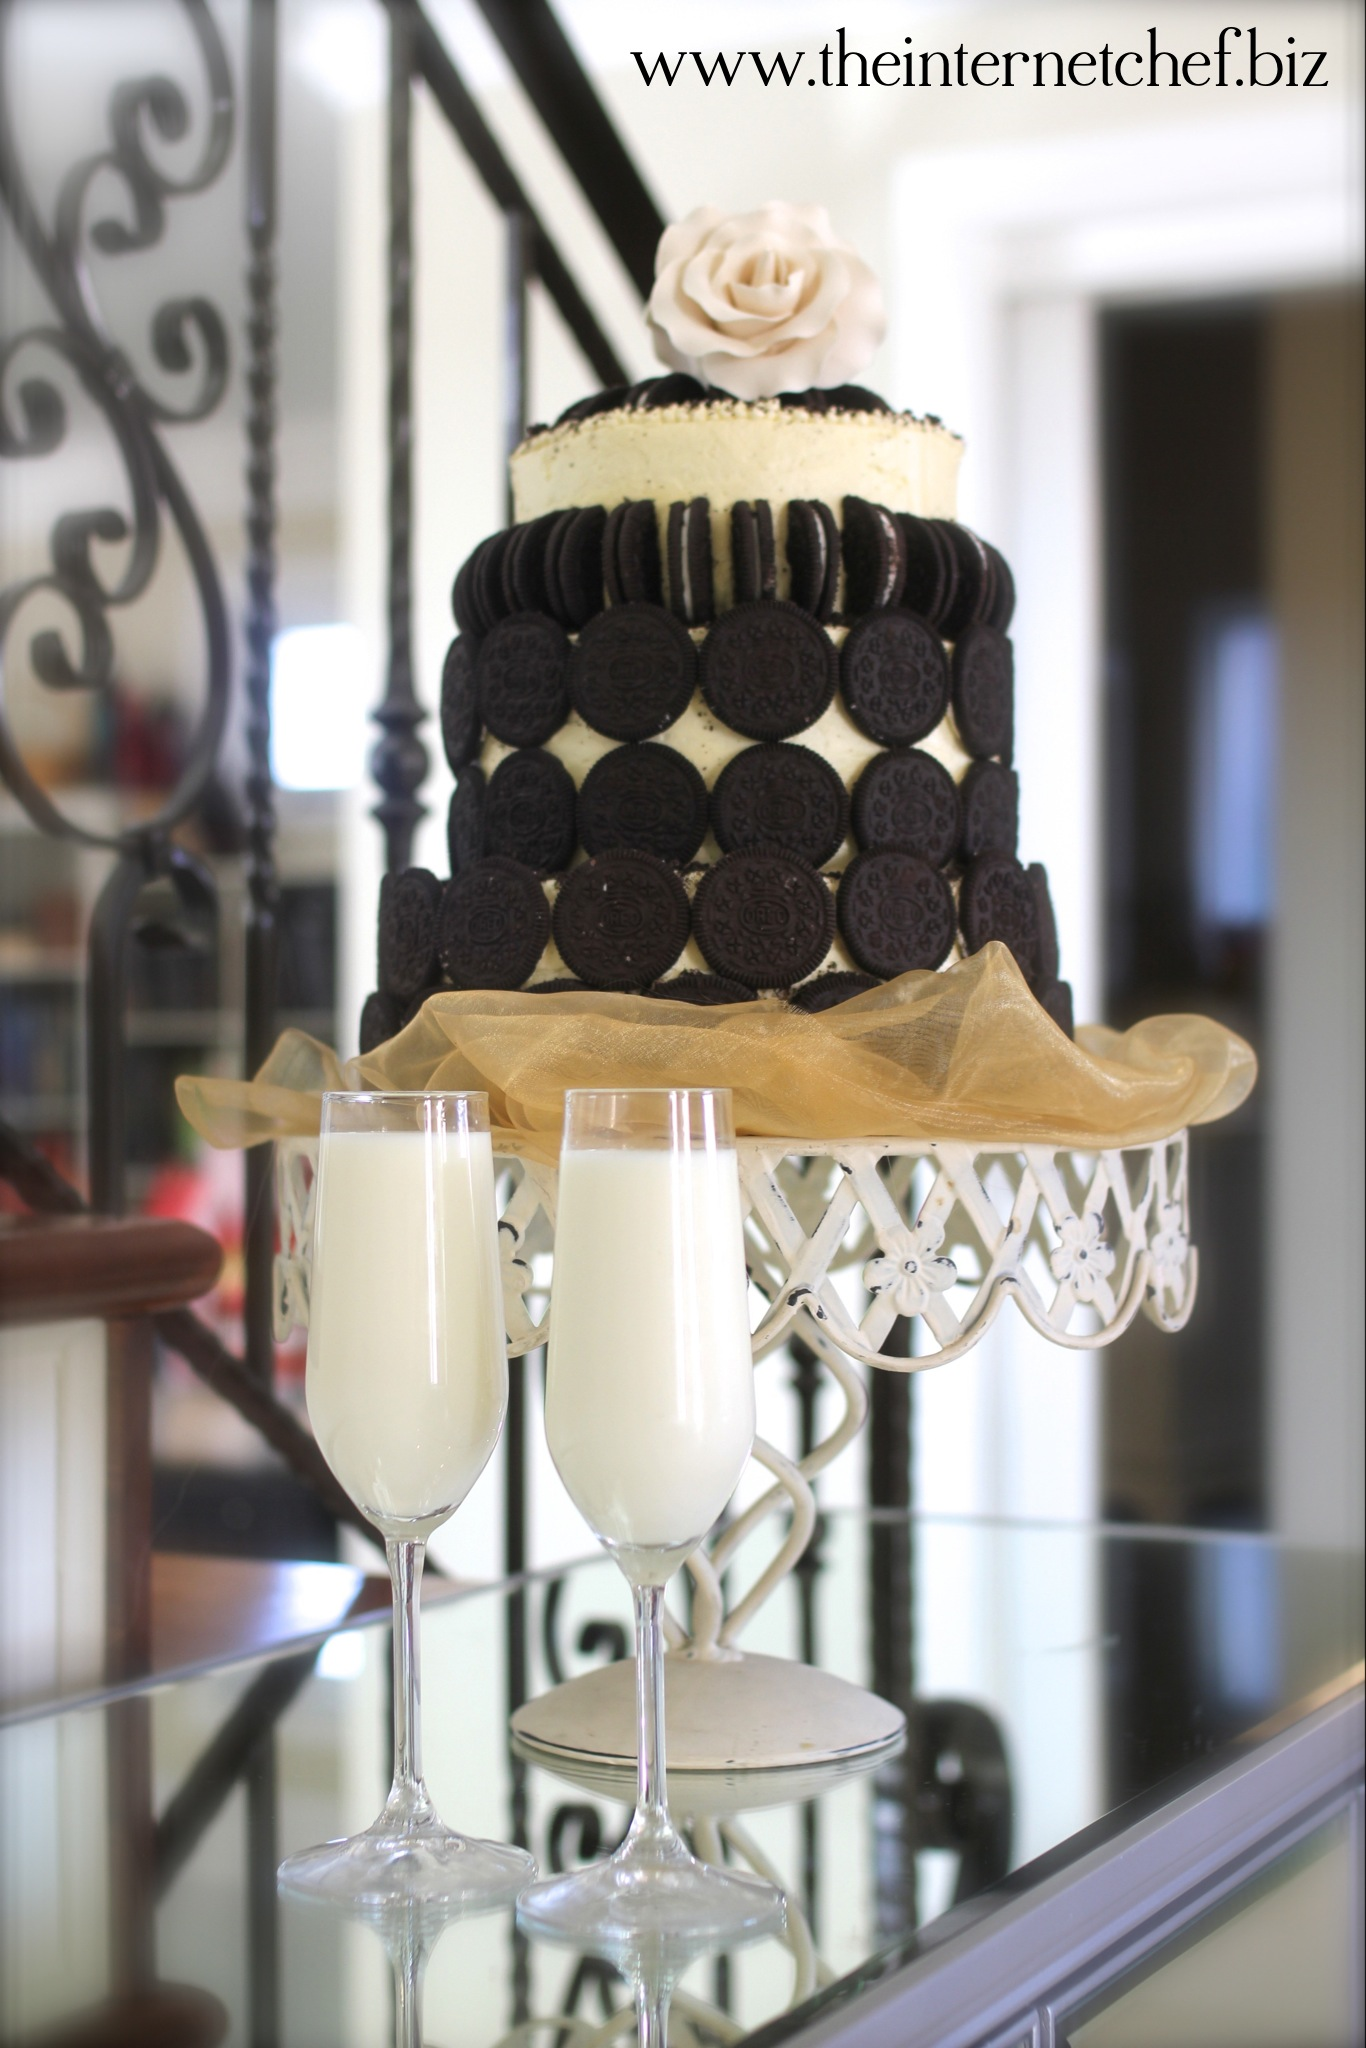 Meet the Oreo Cookie  Toblerone Wedding Cake  The